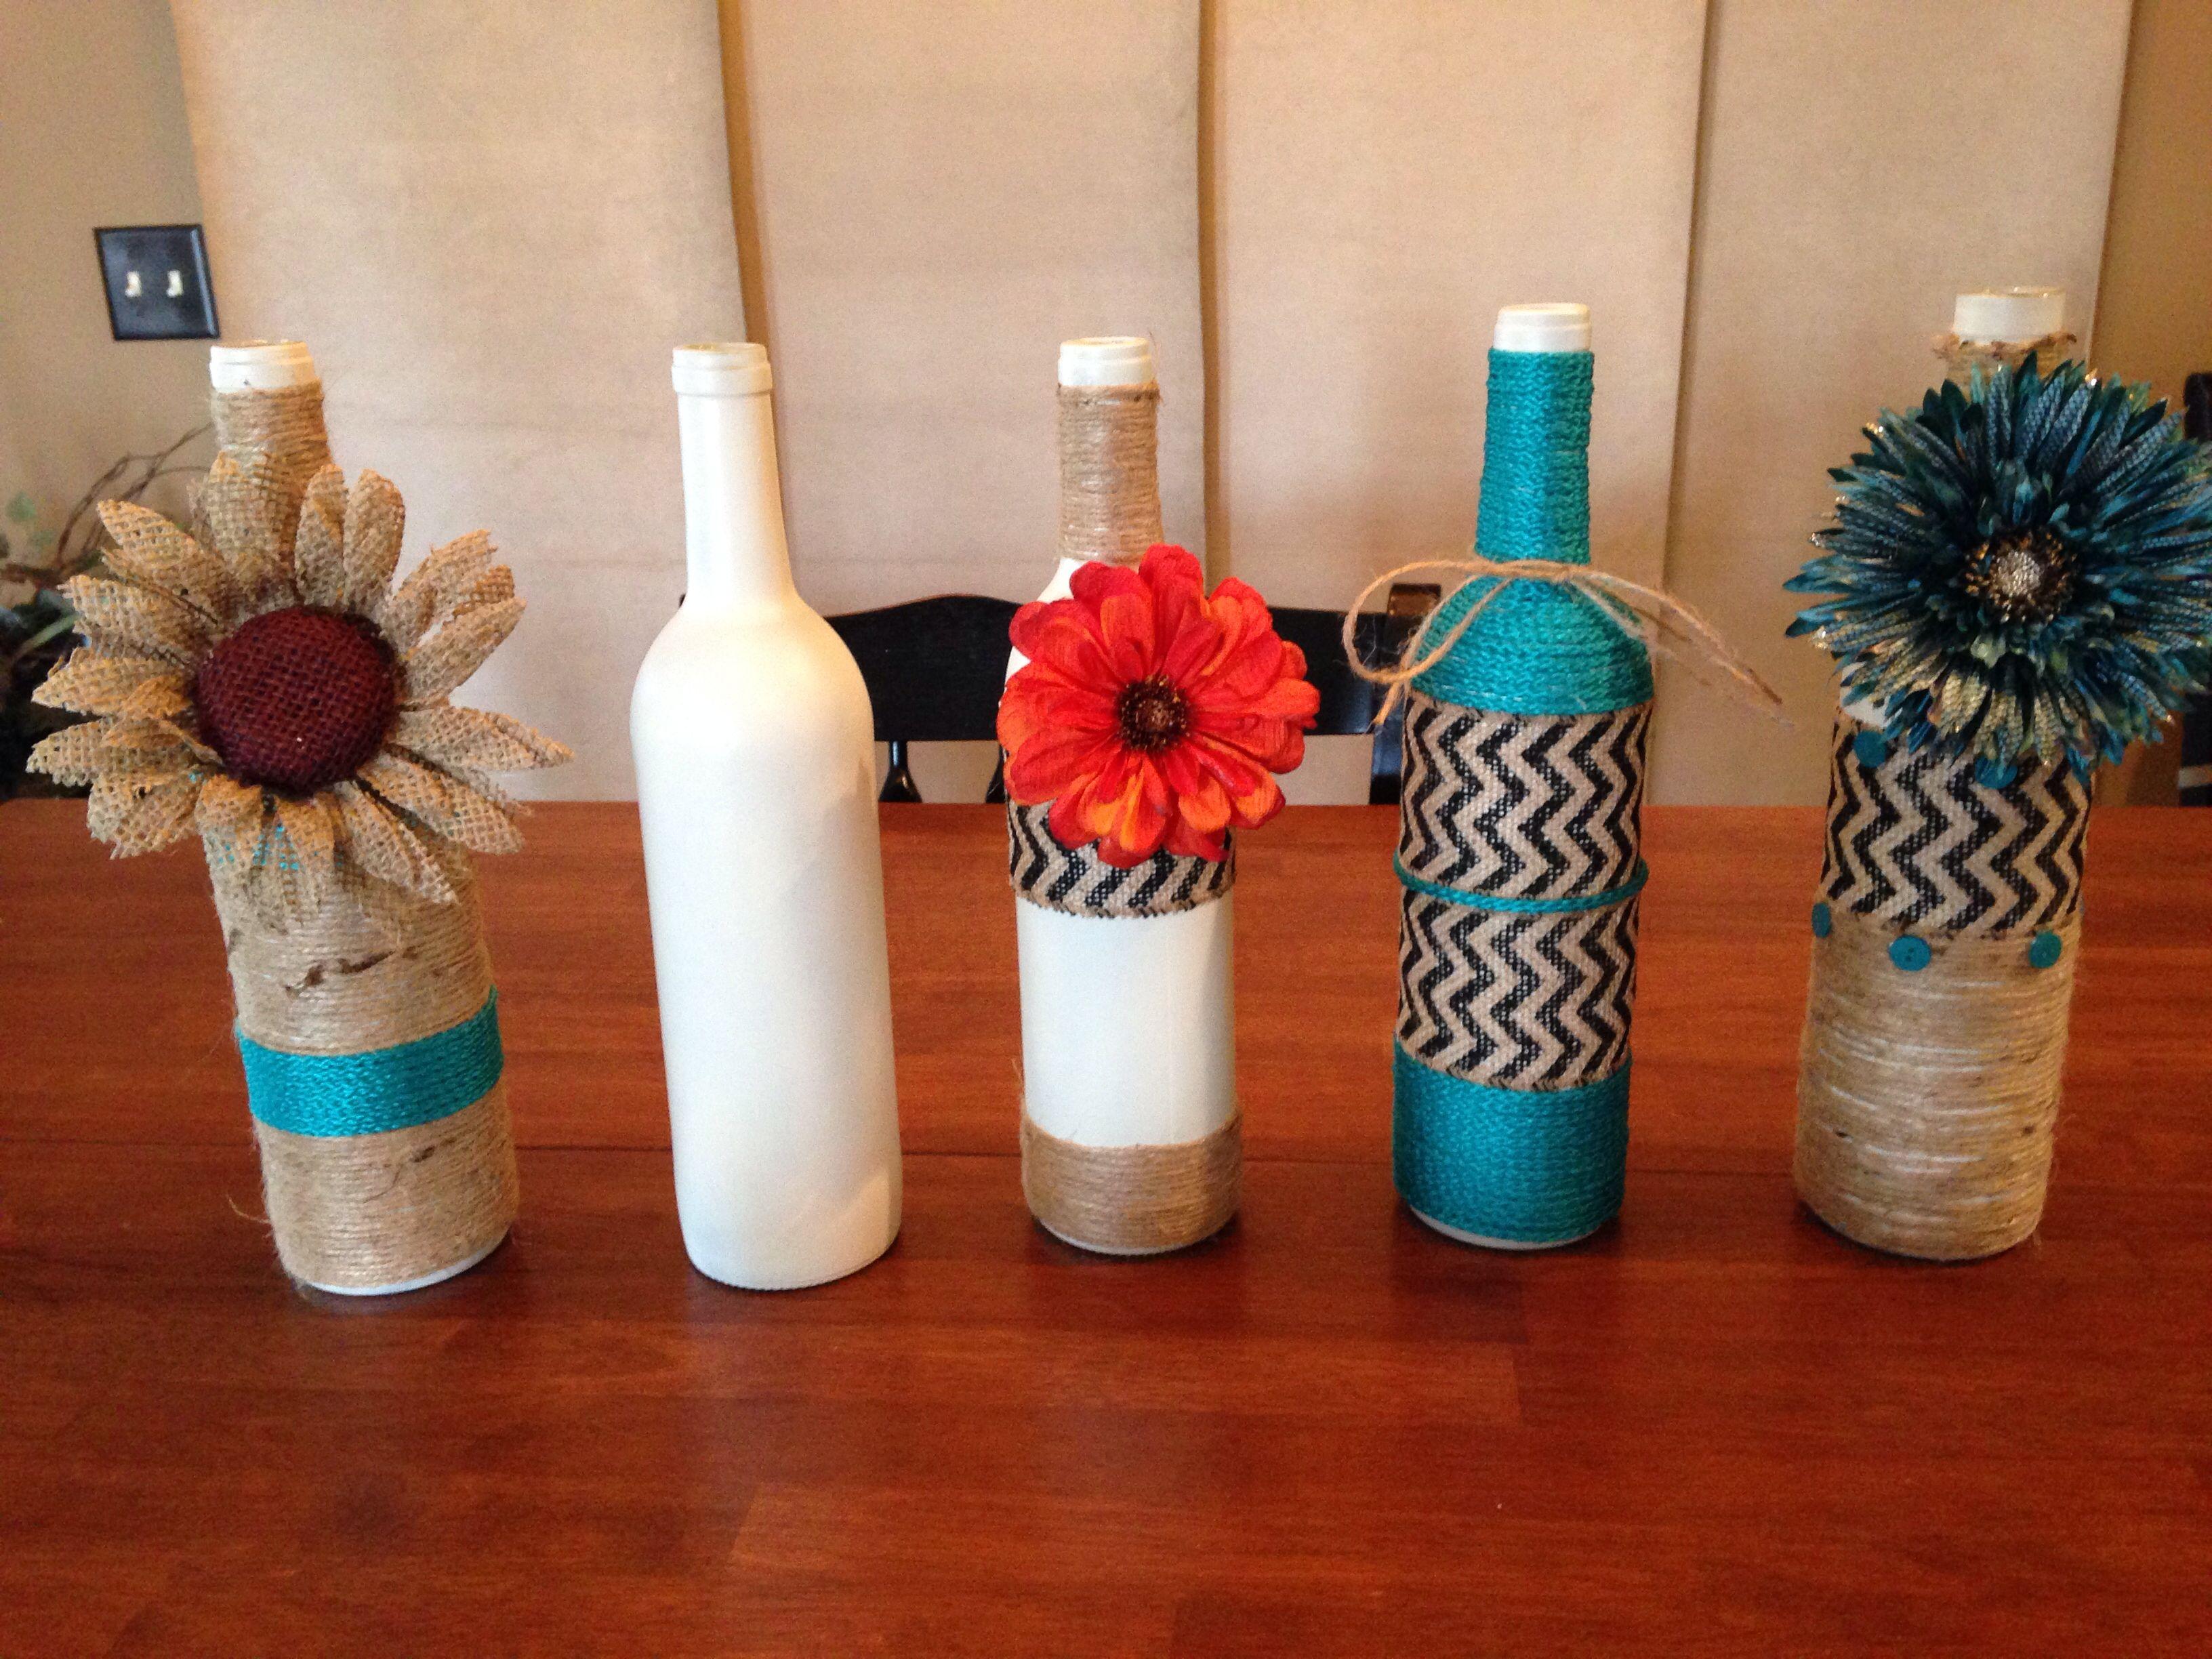 Twine Wine Bottles Painted Before Twining Wine Bottle Crafts Wine Bottle Diy Bottles Decoration